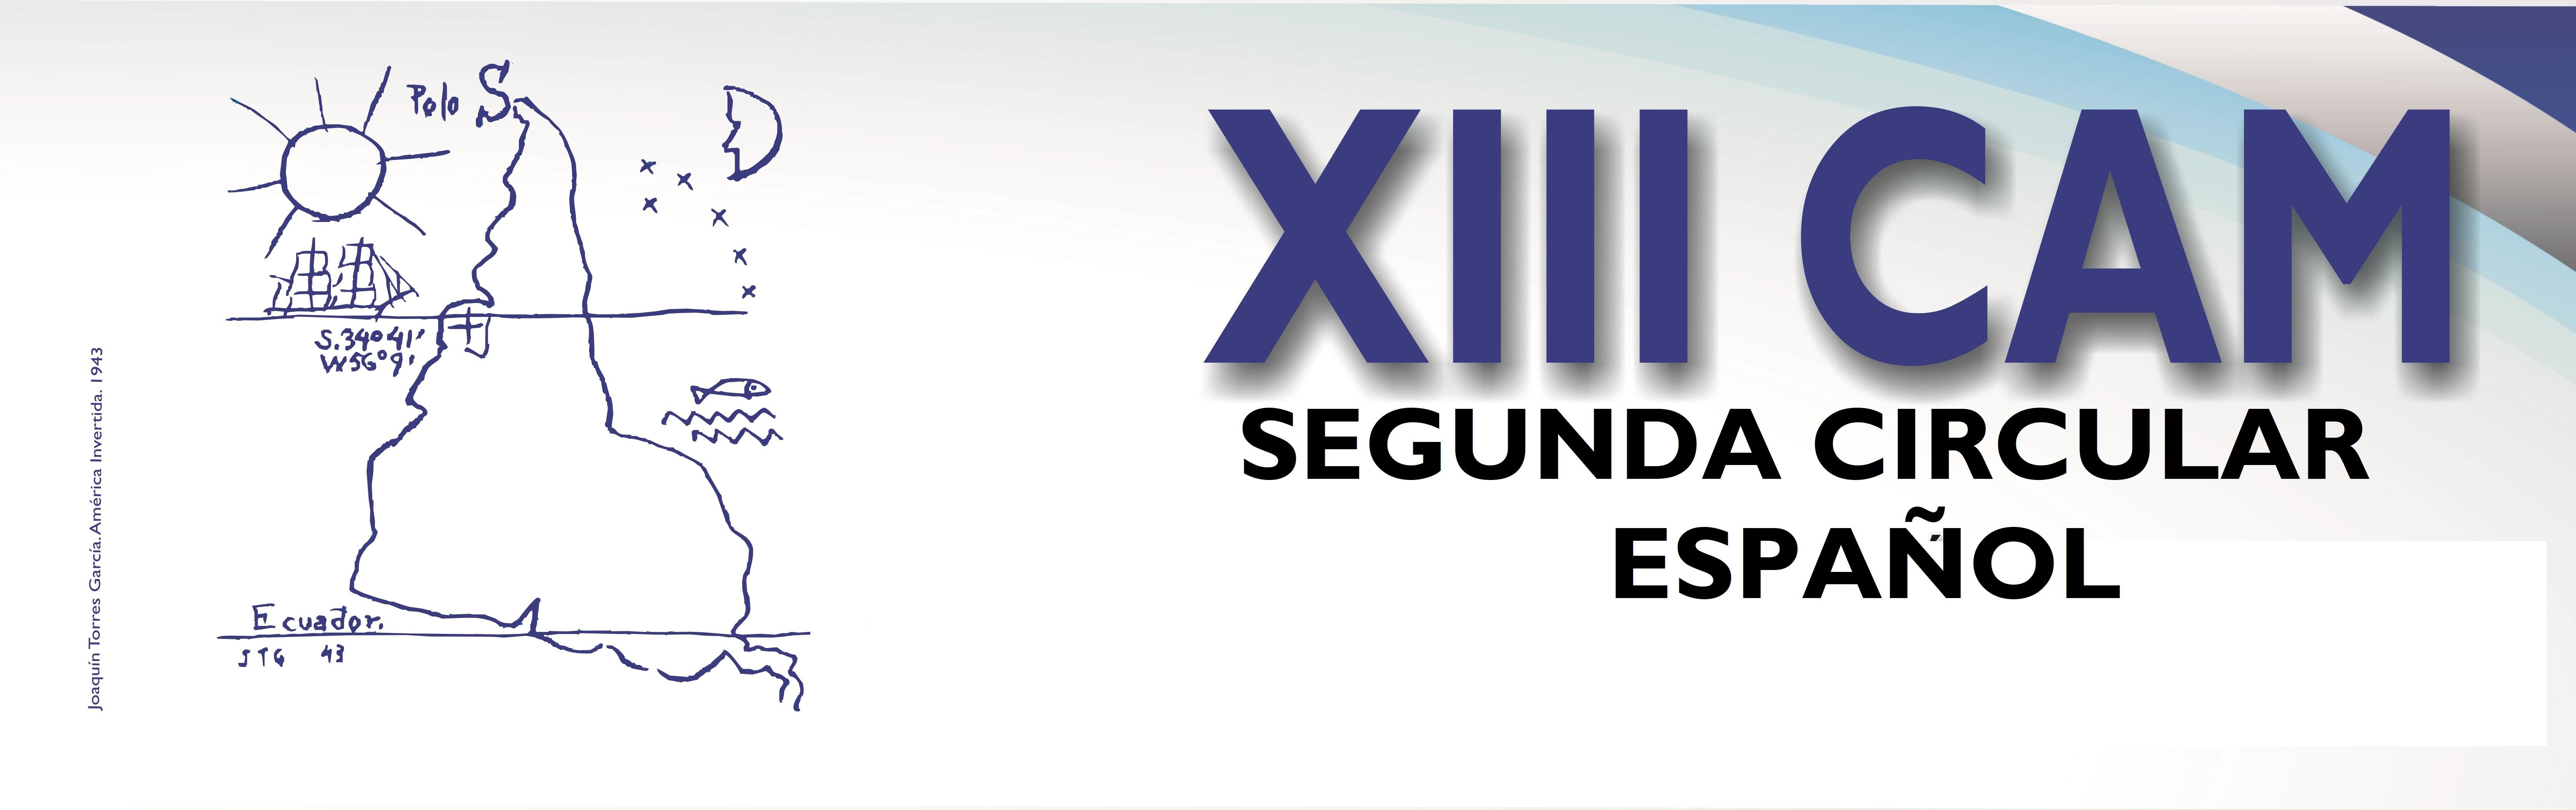 LOGO SEGUNDA CIRCULAR